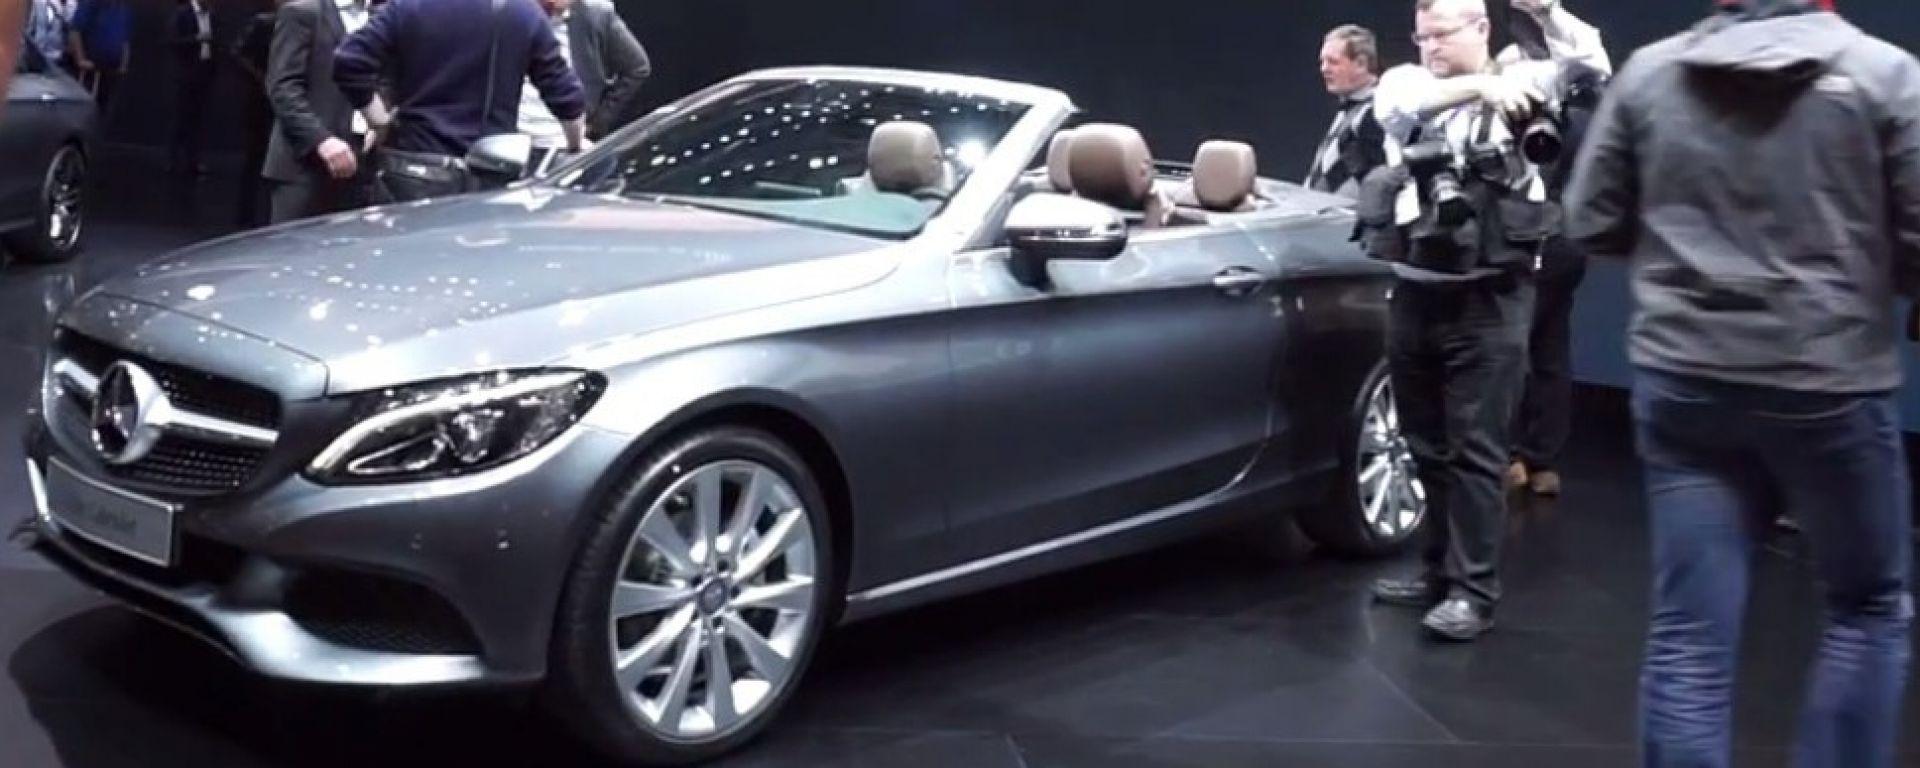 Ginevra 2016: le novità Mercedes